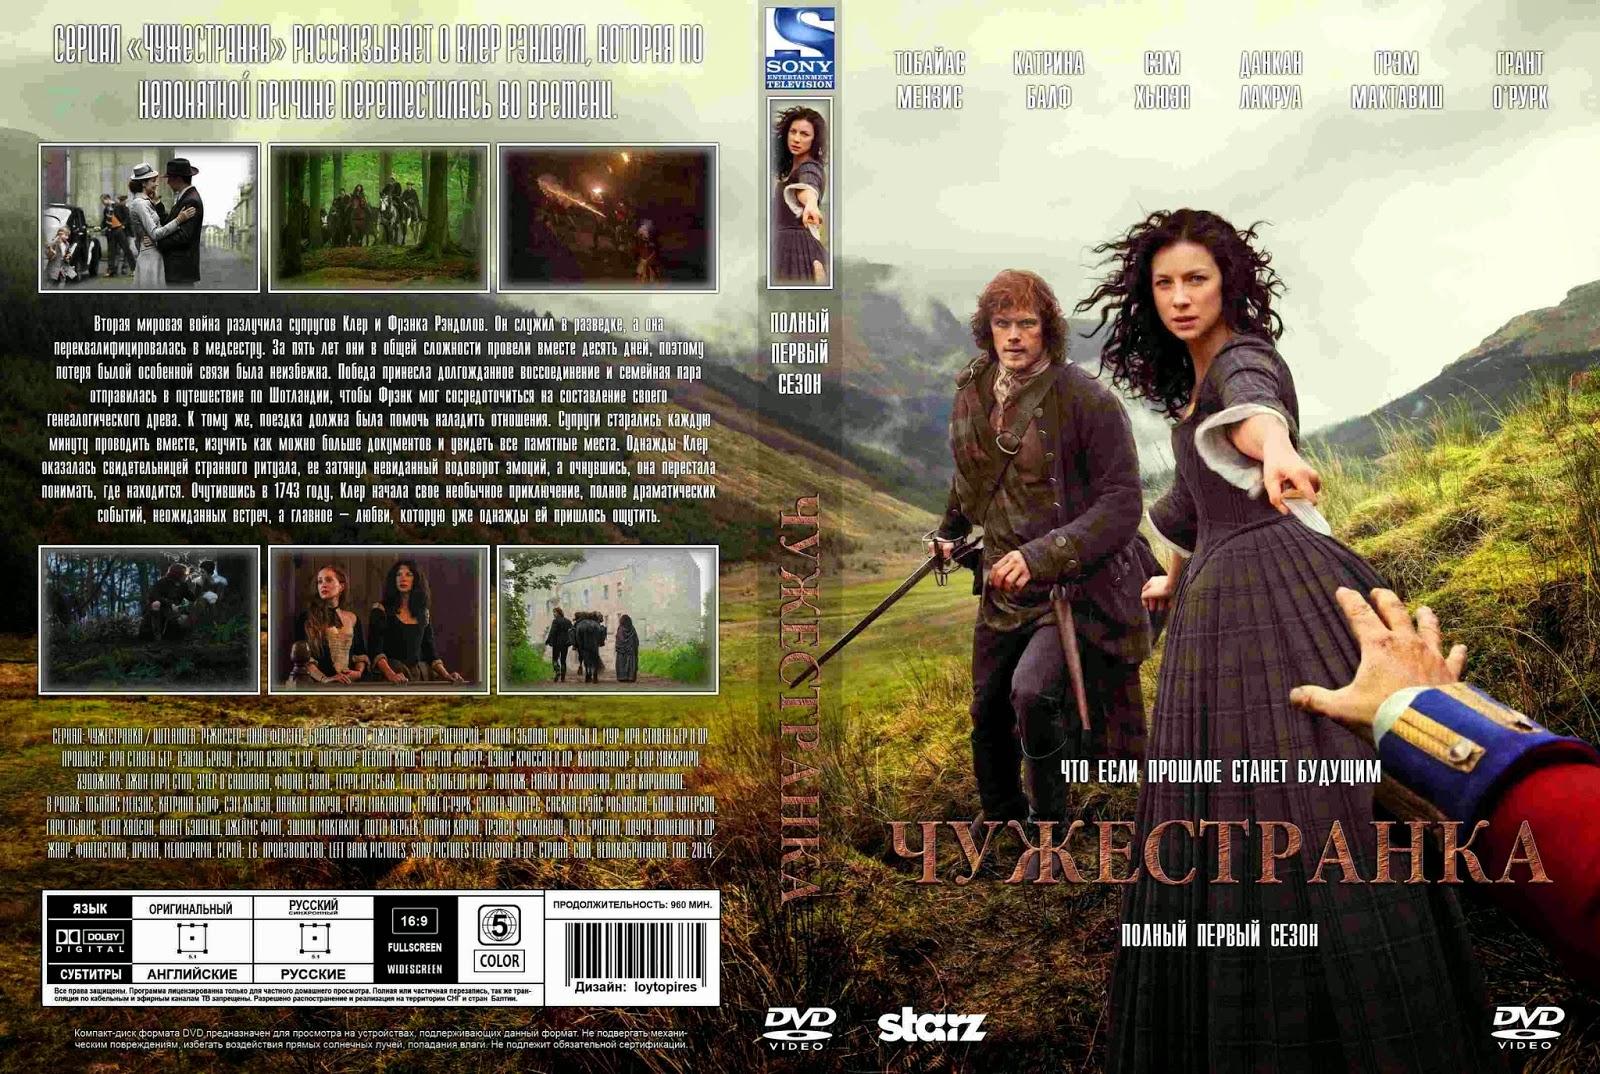 Outlander Series 7 Book Set by Diana Gabaldon - Complete 1-7 Lot